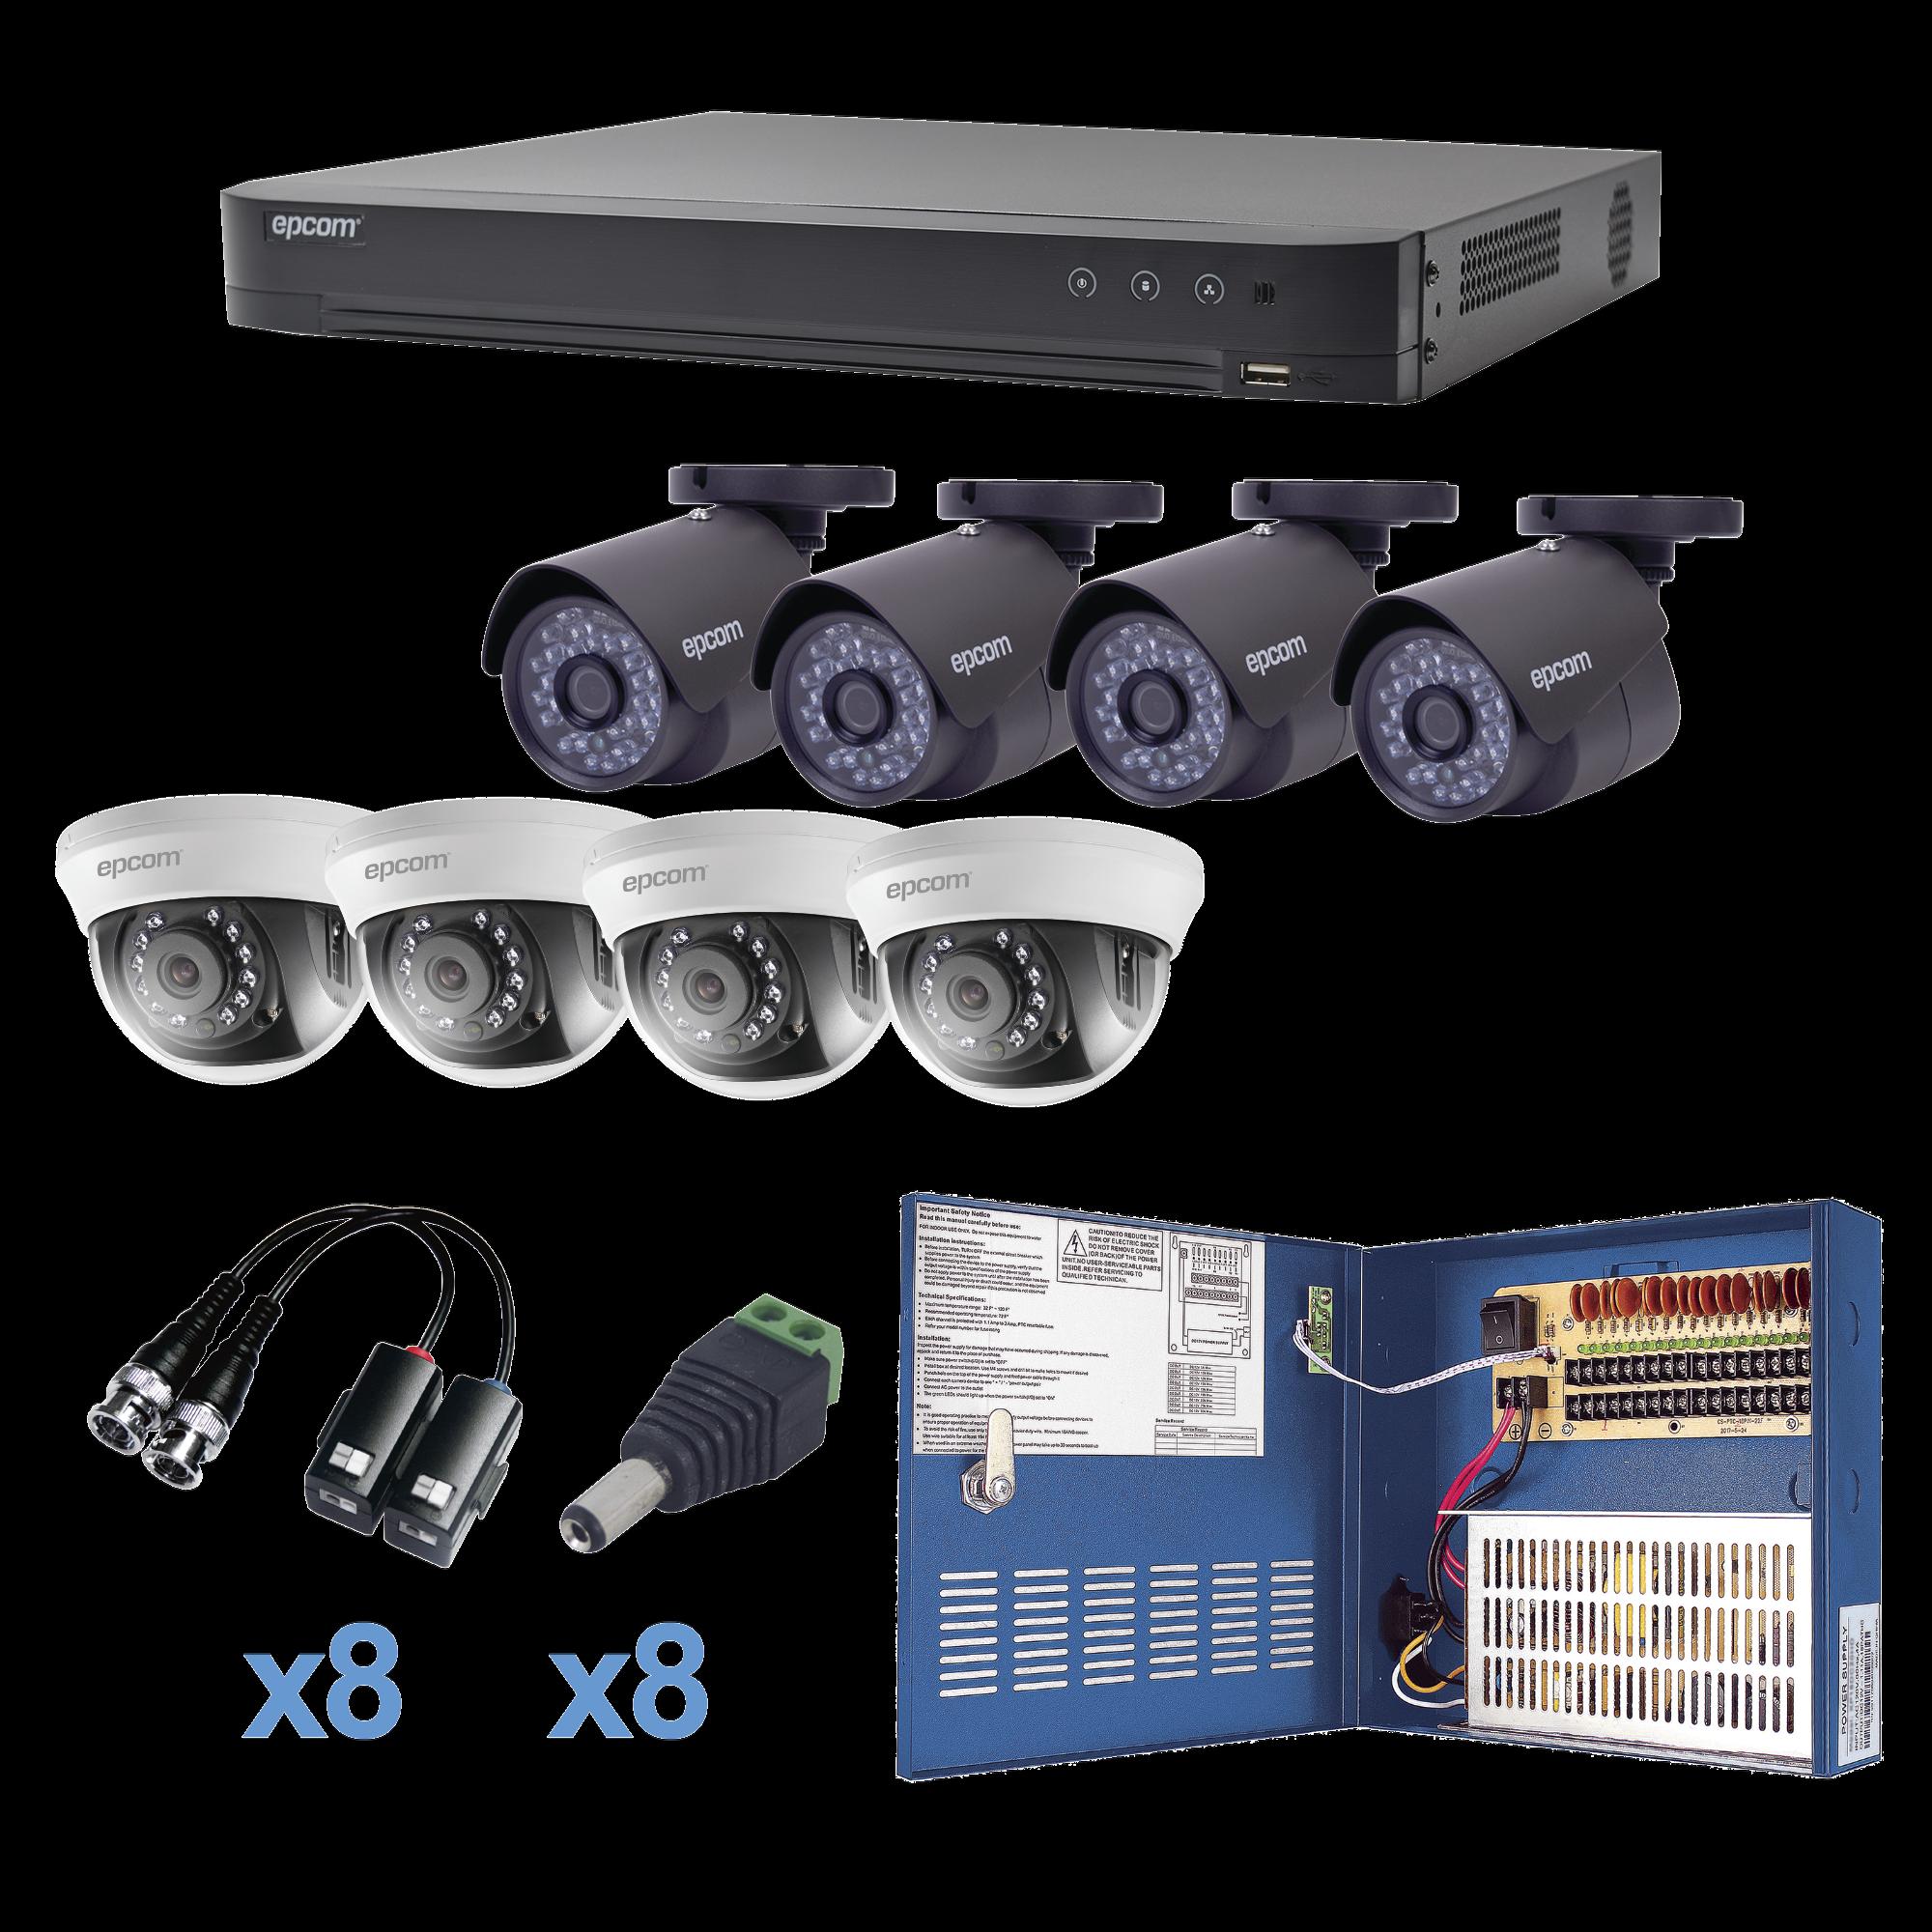 Sistema TURBOHD 1080p / DVR 8 Canales / 4 Cámaras Bala (exterior 2.8 mm) / 4 Cámaras Domos (interior 2.8 mm) / Transceptores / Conectores / Fuente de Poder Profesional hasta 15 Vcd para Larga Distancia